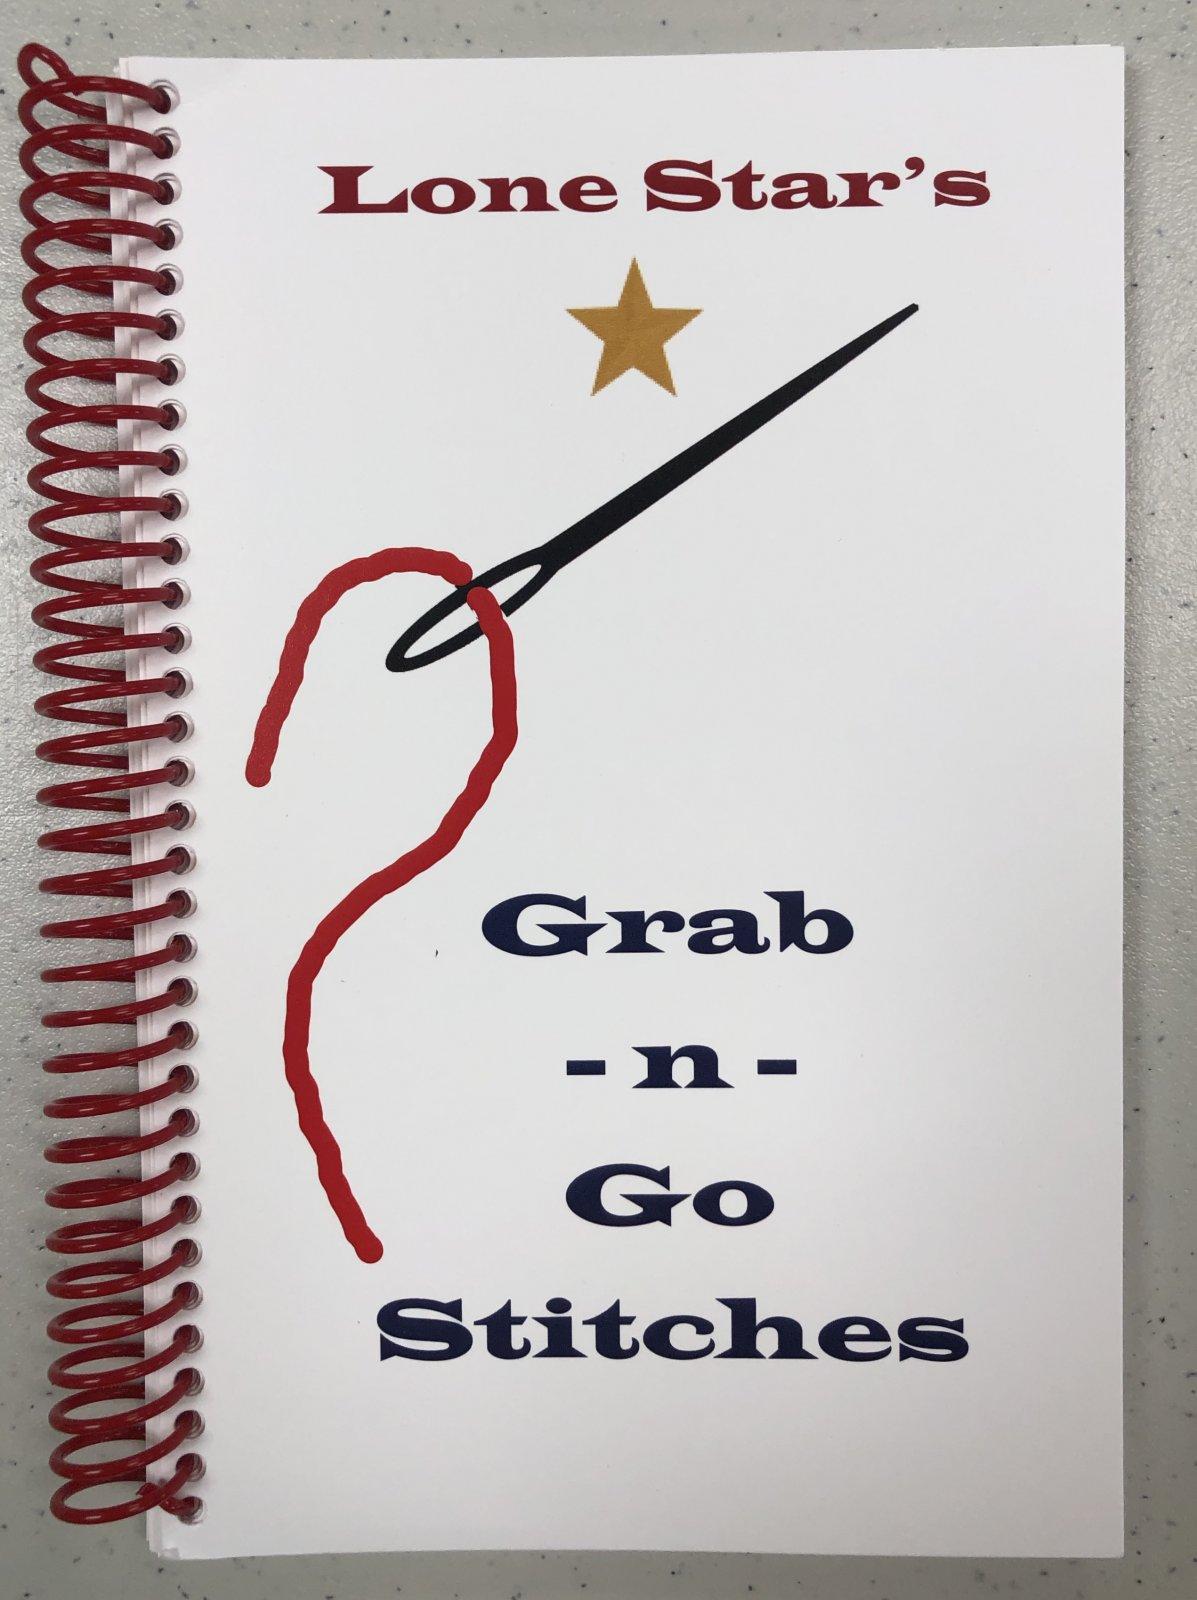 lone star's grab -n- go stitches